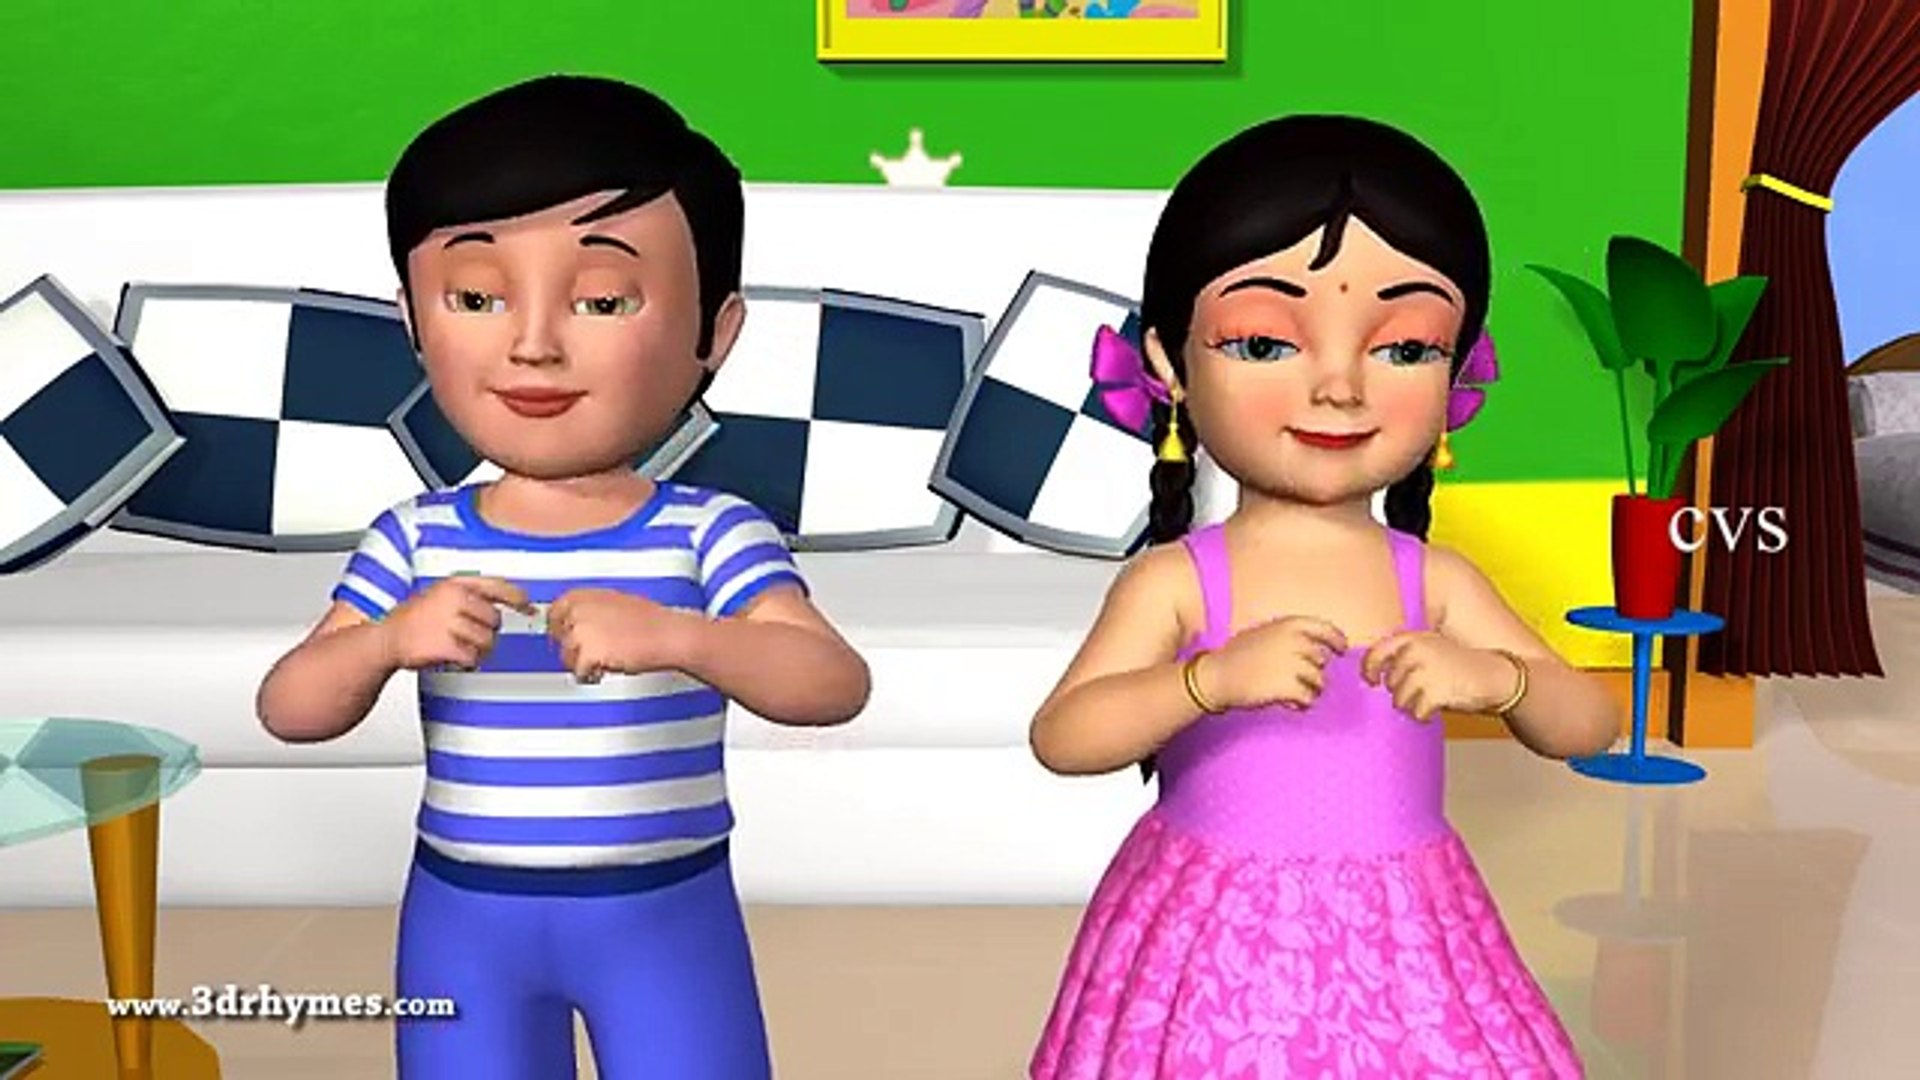 Learn Body Parts In song-Nursery Rhymes-Kids Song-Kids Video